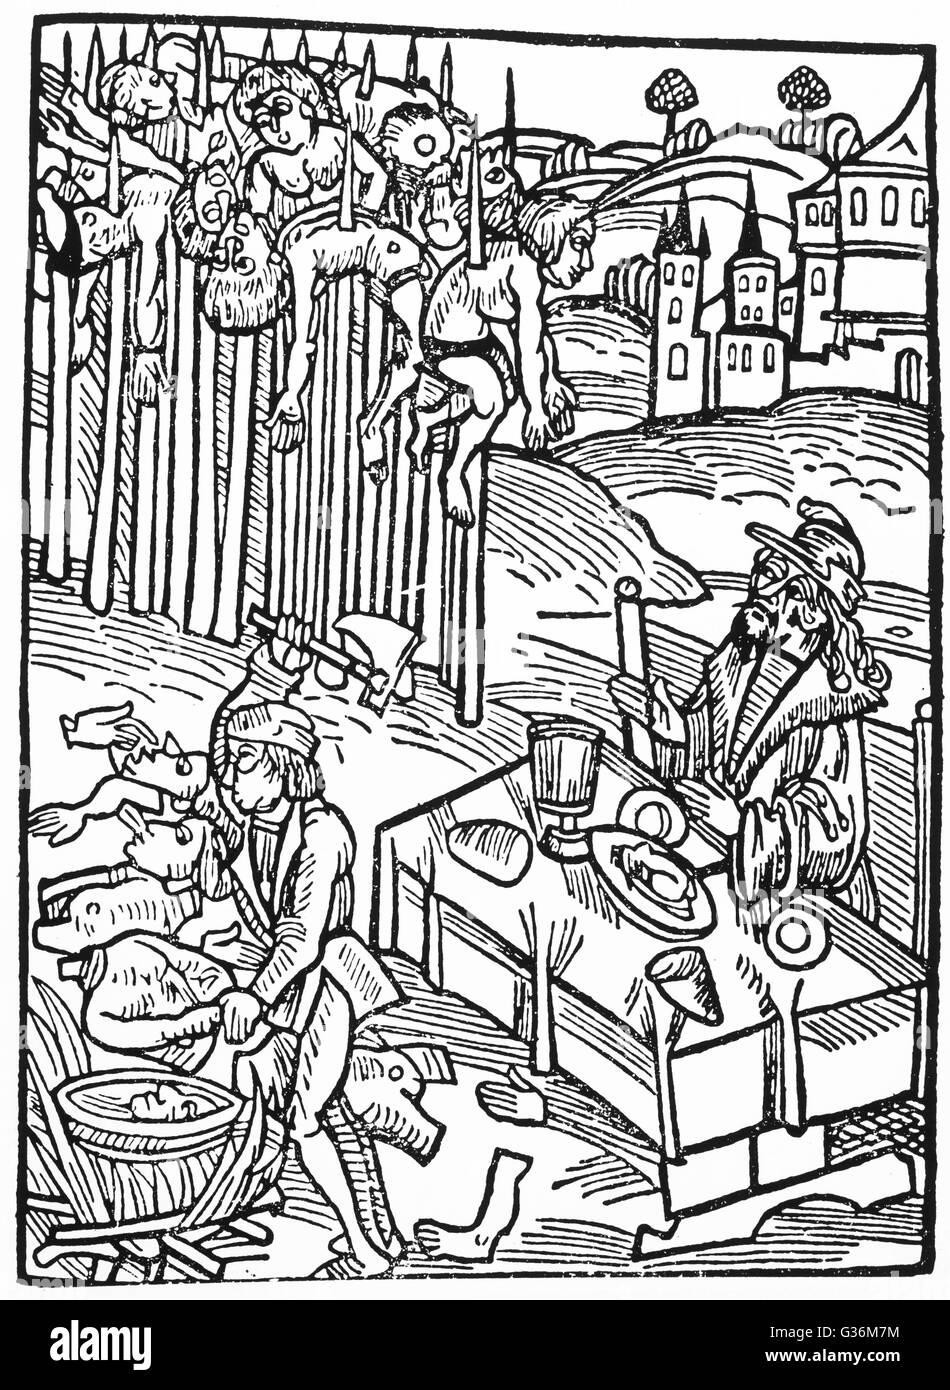 Vlad III Tepes (Vlad the Impaler) (1431-1476) Romanian prince of Wallachia Basis of Stoker's 'Dracula' Seen here Stock Photo